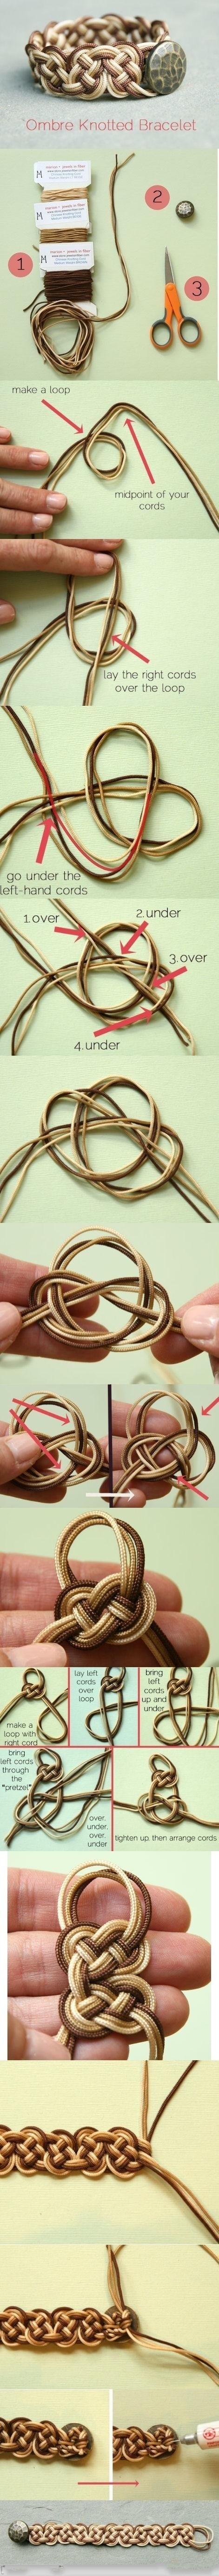 DIY Ombre Knotted Bracelet